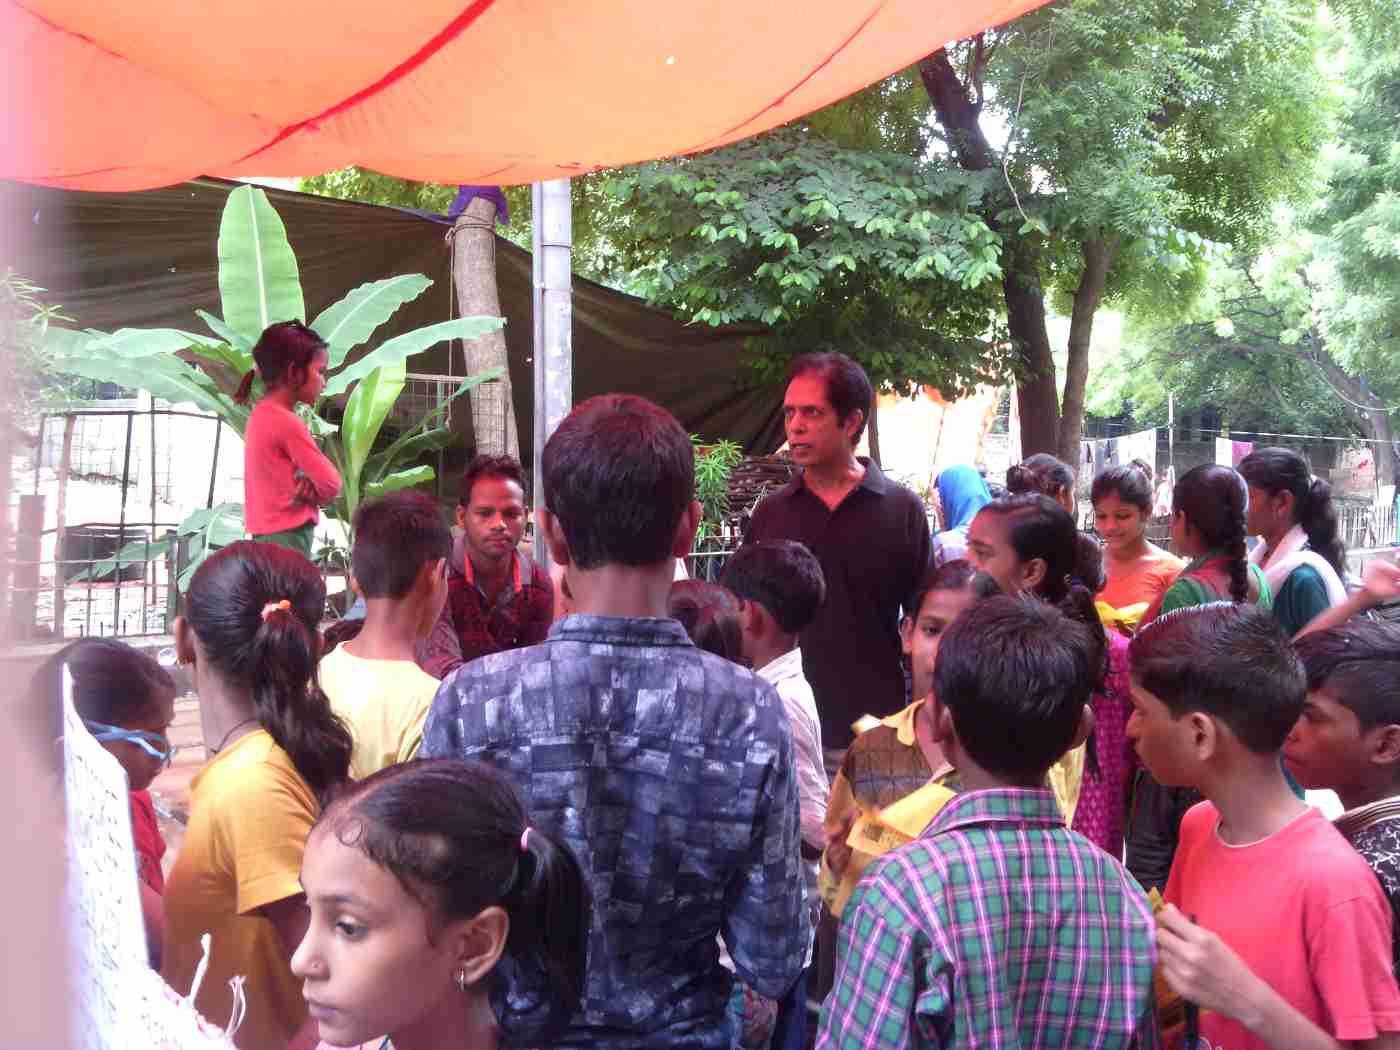 RMN Foundation School teacher Rakesh Raman explaining the benefits of modern alternative education to people in a street of Delhi.